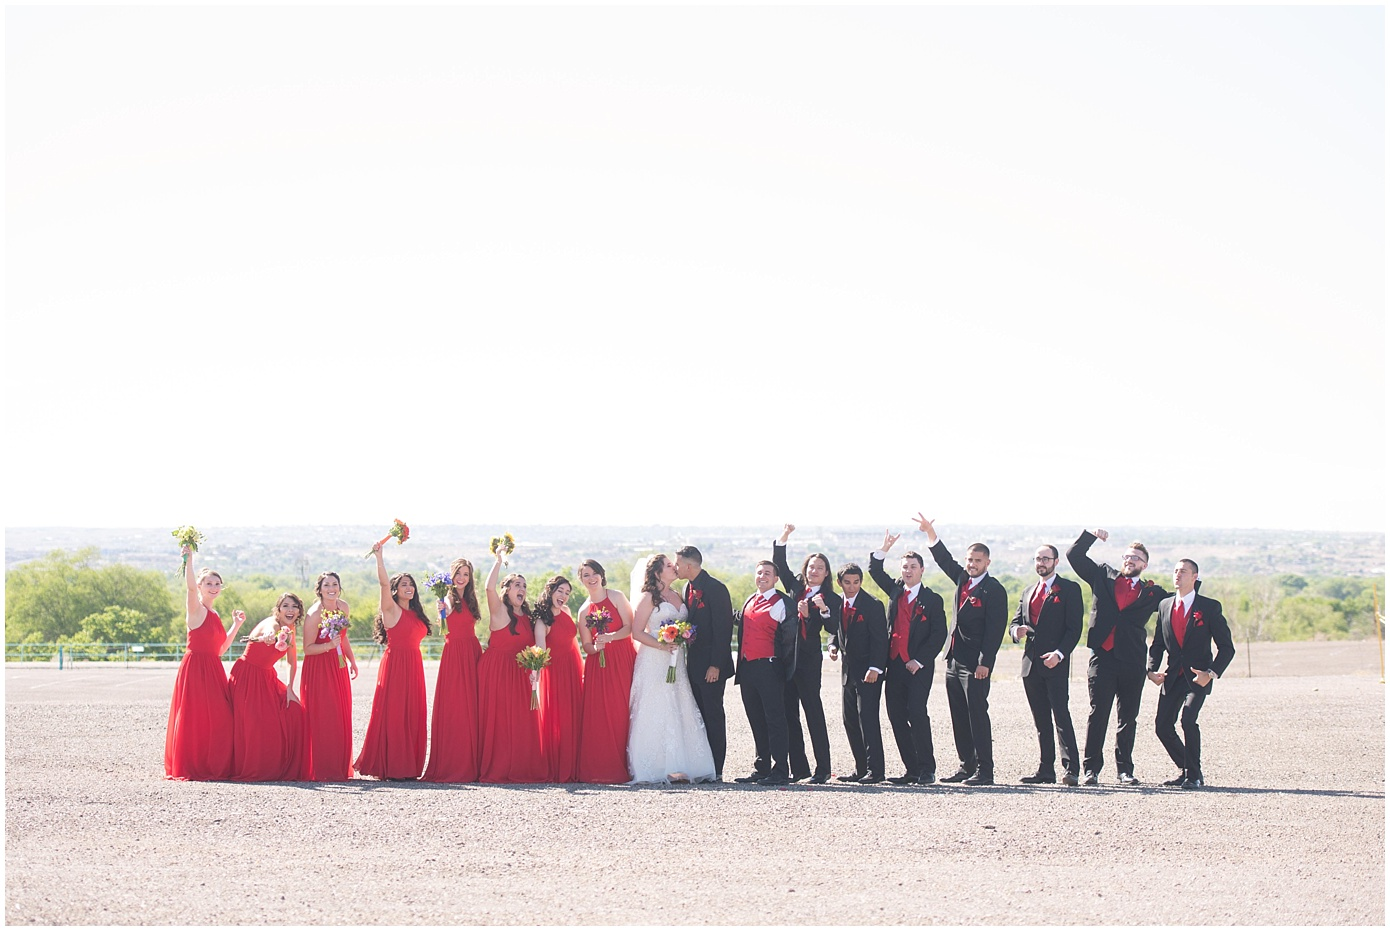 kayla kitts photography-justine-brian-wedding-balloon-fiesta_0025.jpg